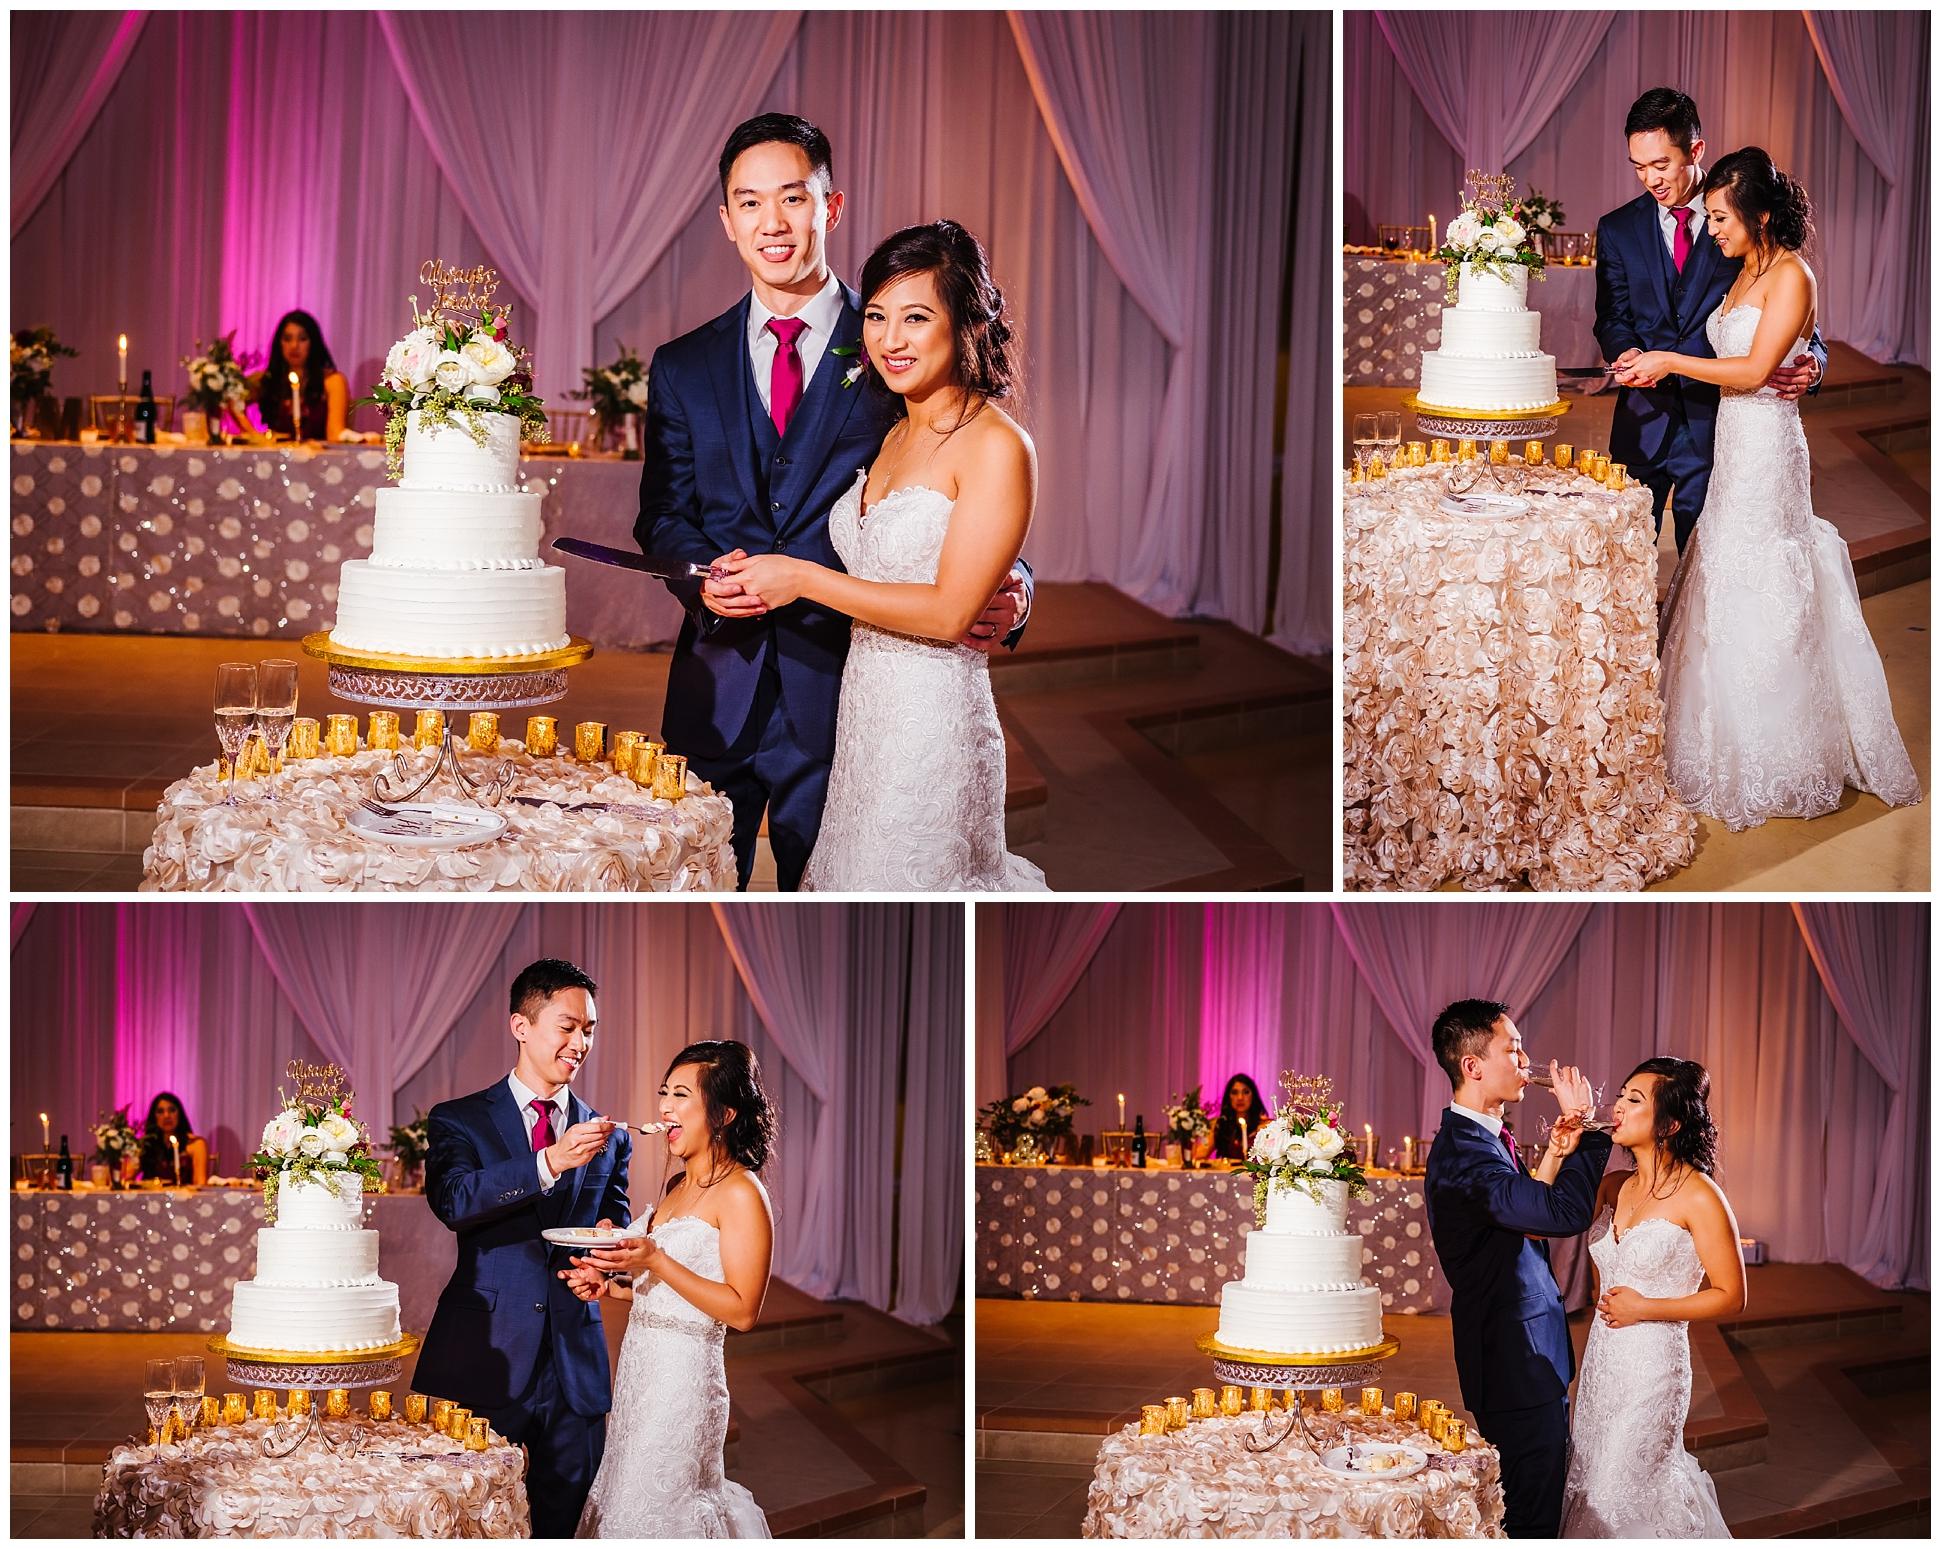 tampa-wedding-photographer-philipino-colorful-woods-ballroom-church-mass-confetti-fuscia_0070.jpg